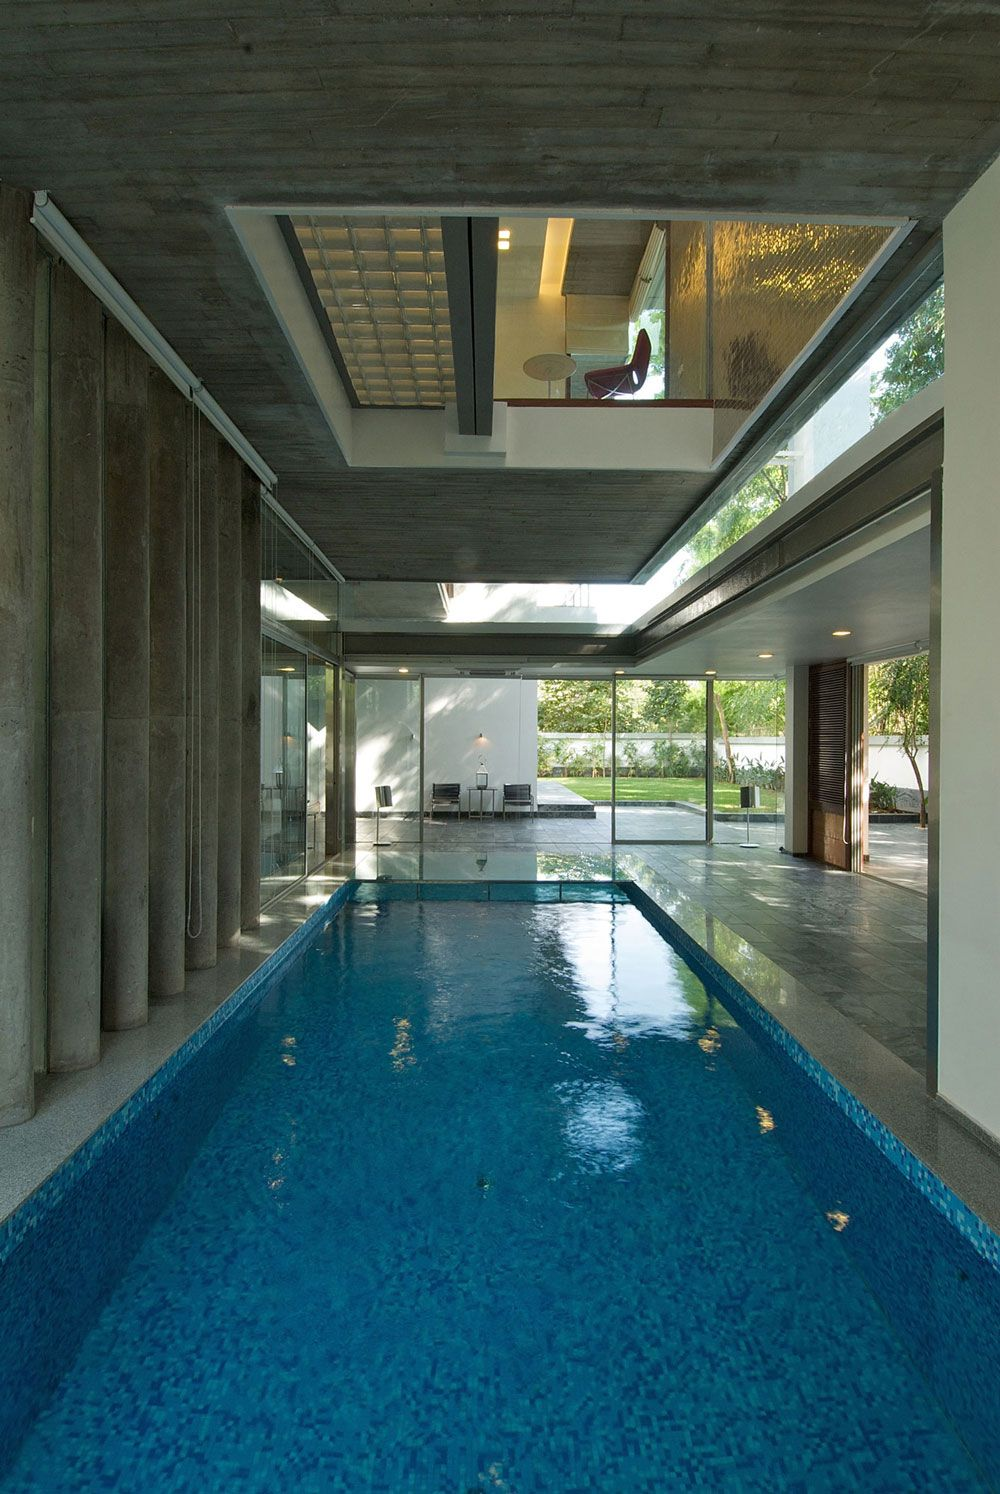 Indoor Pool Glass Walls Poona House In Mumbai India By Rajiv Saini Luxury Pools Indoor Pool Houses Luxury Swimming Pools